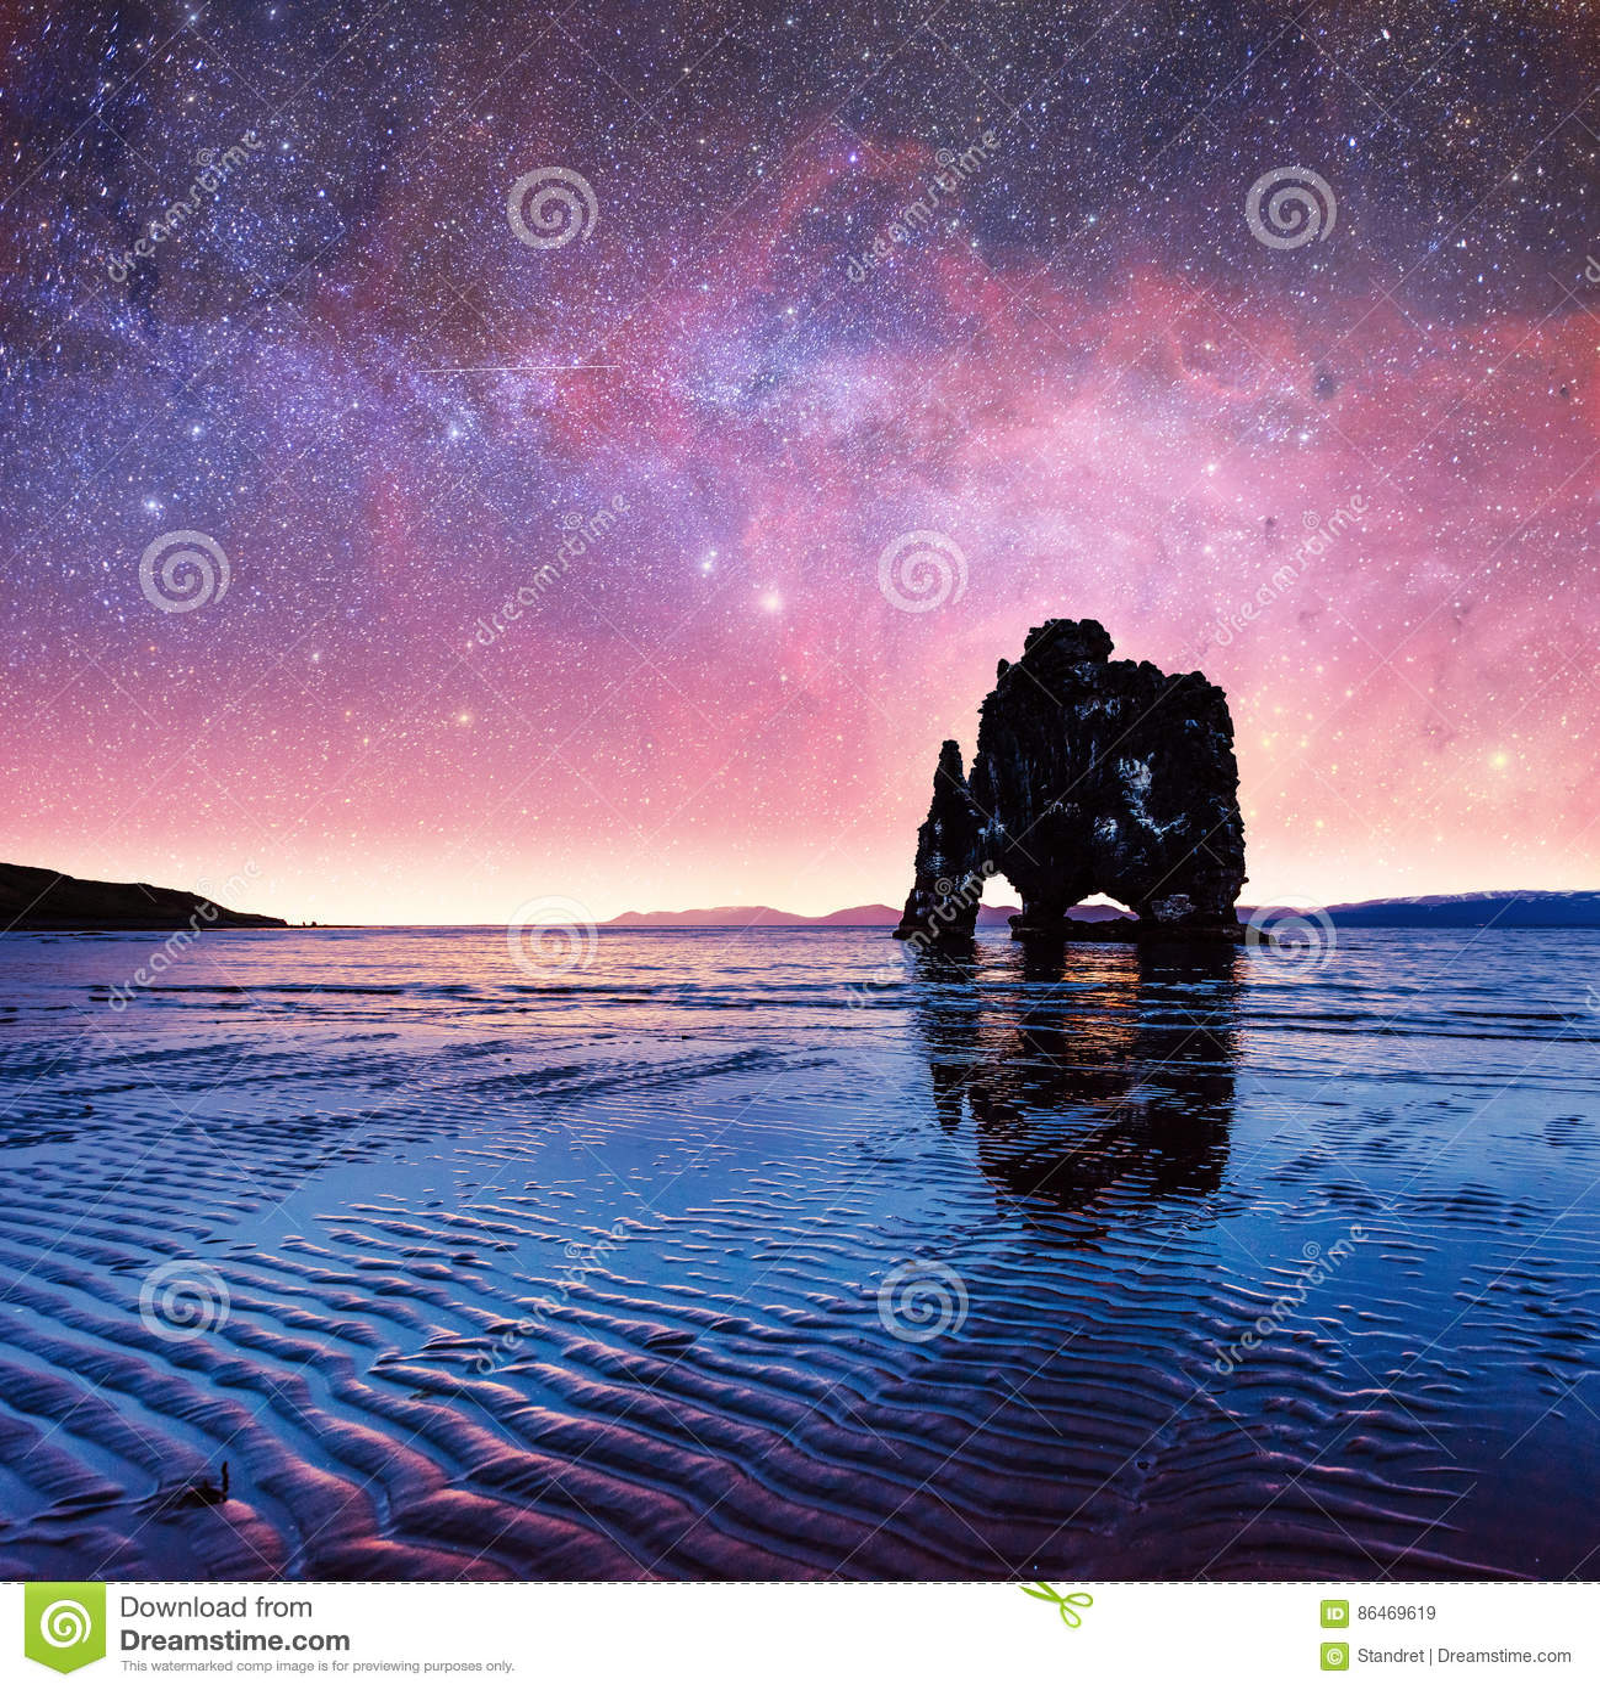 Hvitserkur 15 m高度 意想不到的满天星斗的天空和银河o